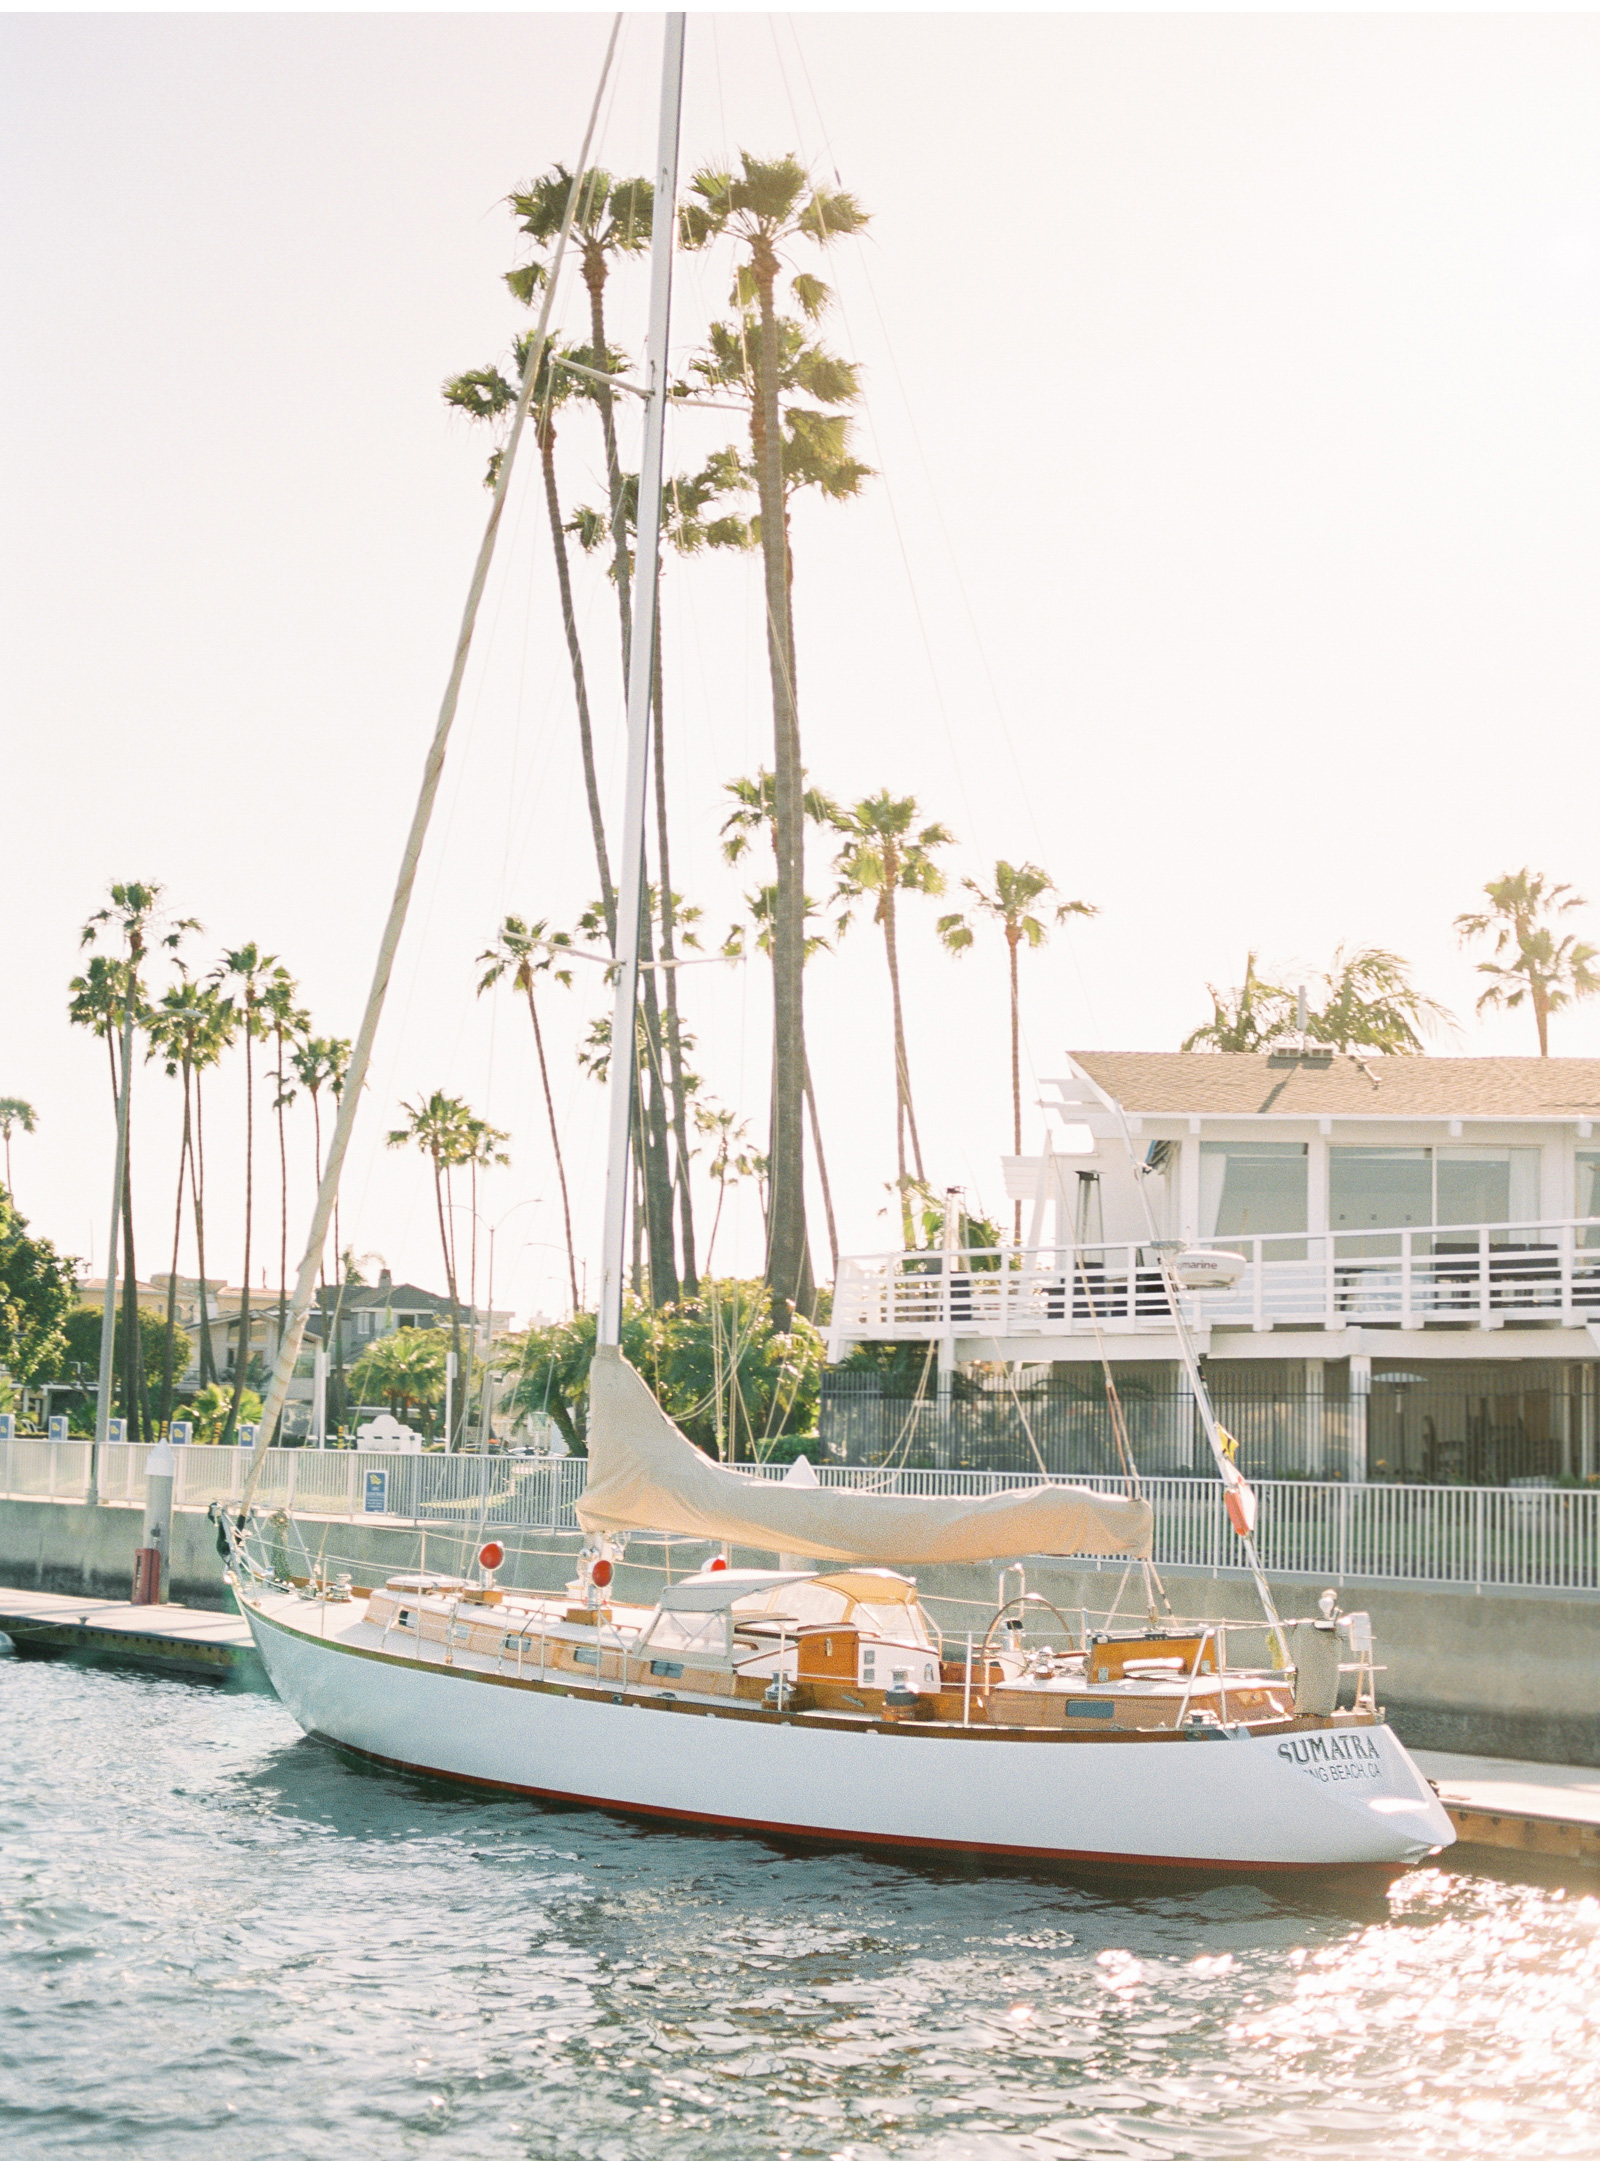 Anniversaries-on-the-Water-Long-Beach-Anniversary-Southern-California-Wedding-Photographer-Fine-Art-Wedding-Photos-Anniversary-on-Boat-Natalie-Schutt-Photography_11.jpg